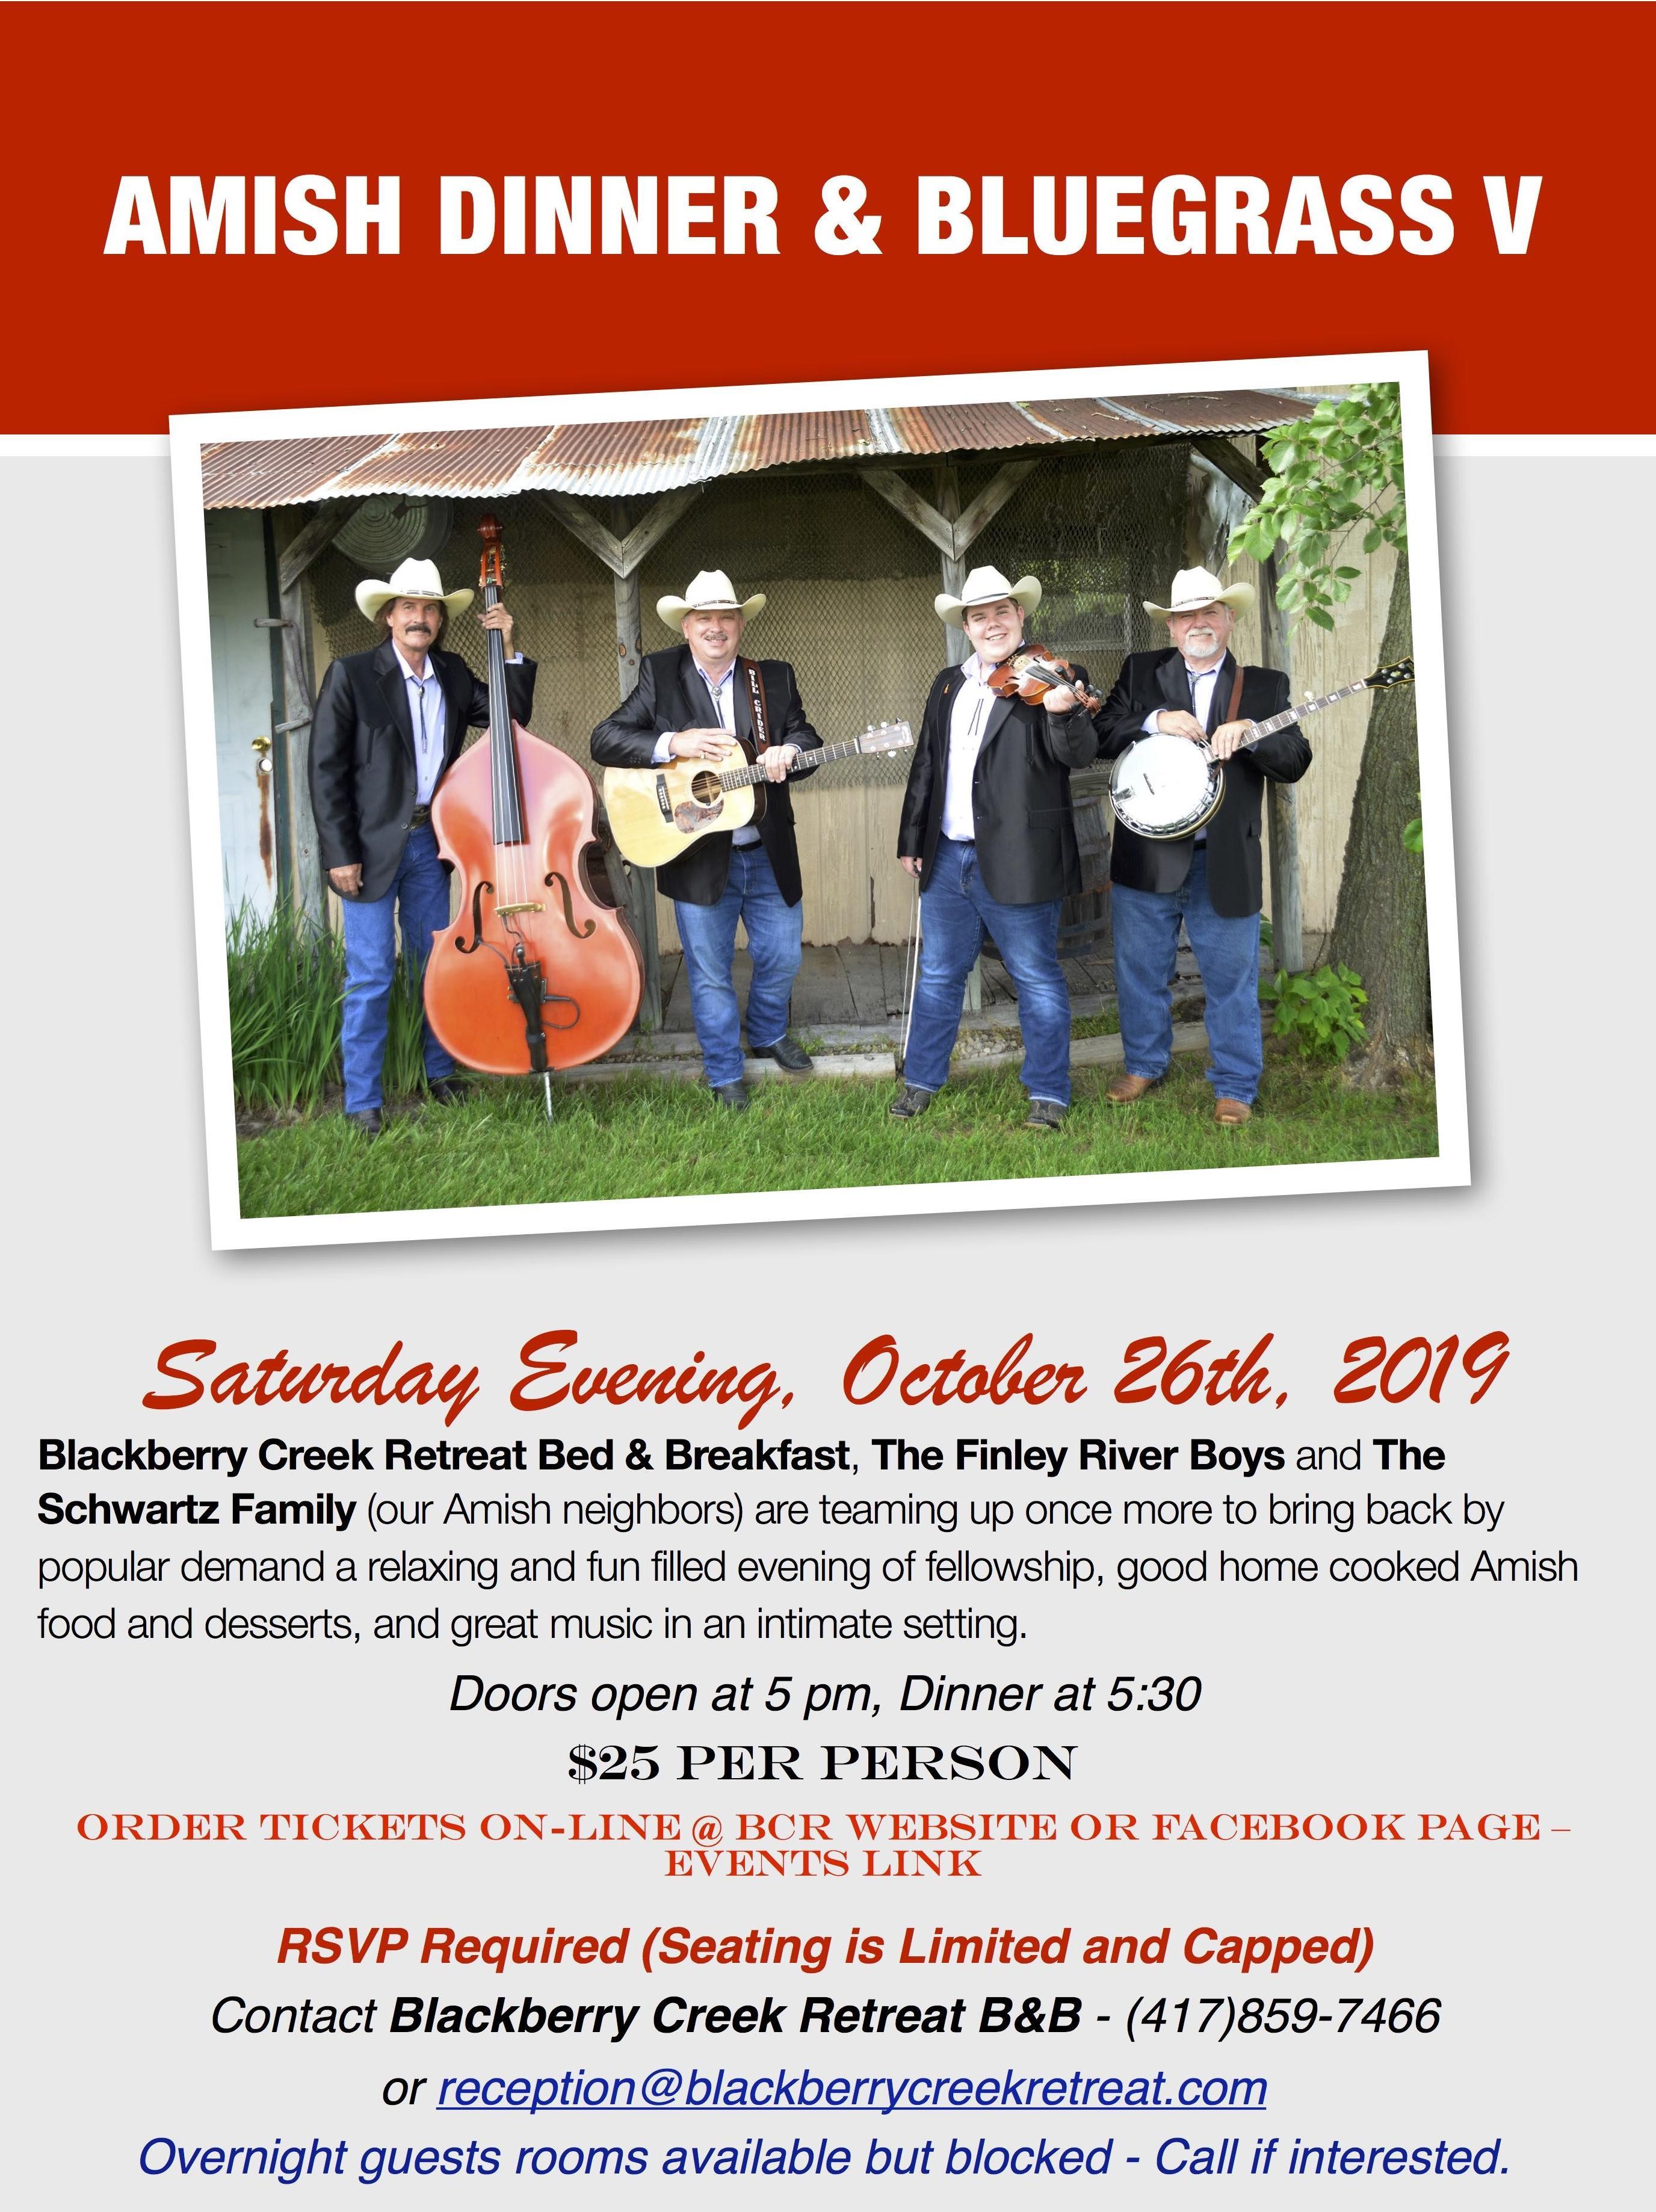 Amish Dinner & Bluegrass V